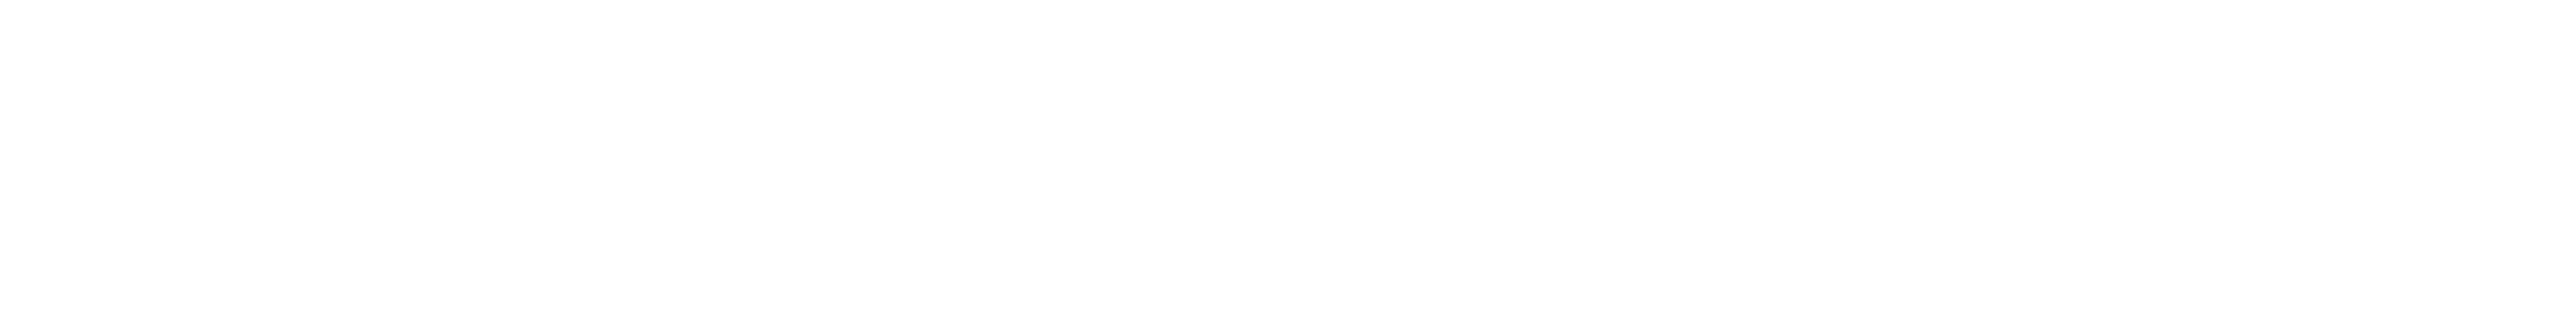 PsyBNC   Unix Shell   Radio ShoutCast   Dedicated Servers